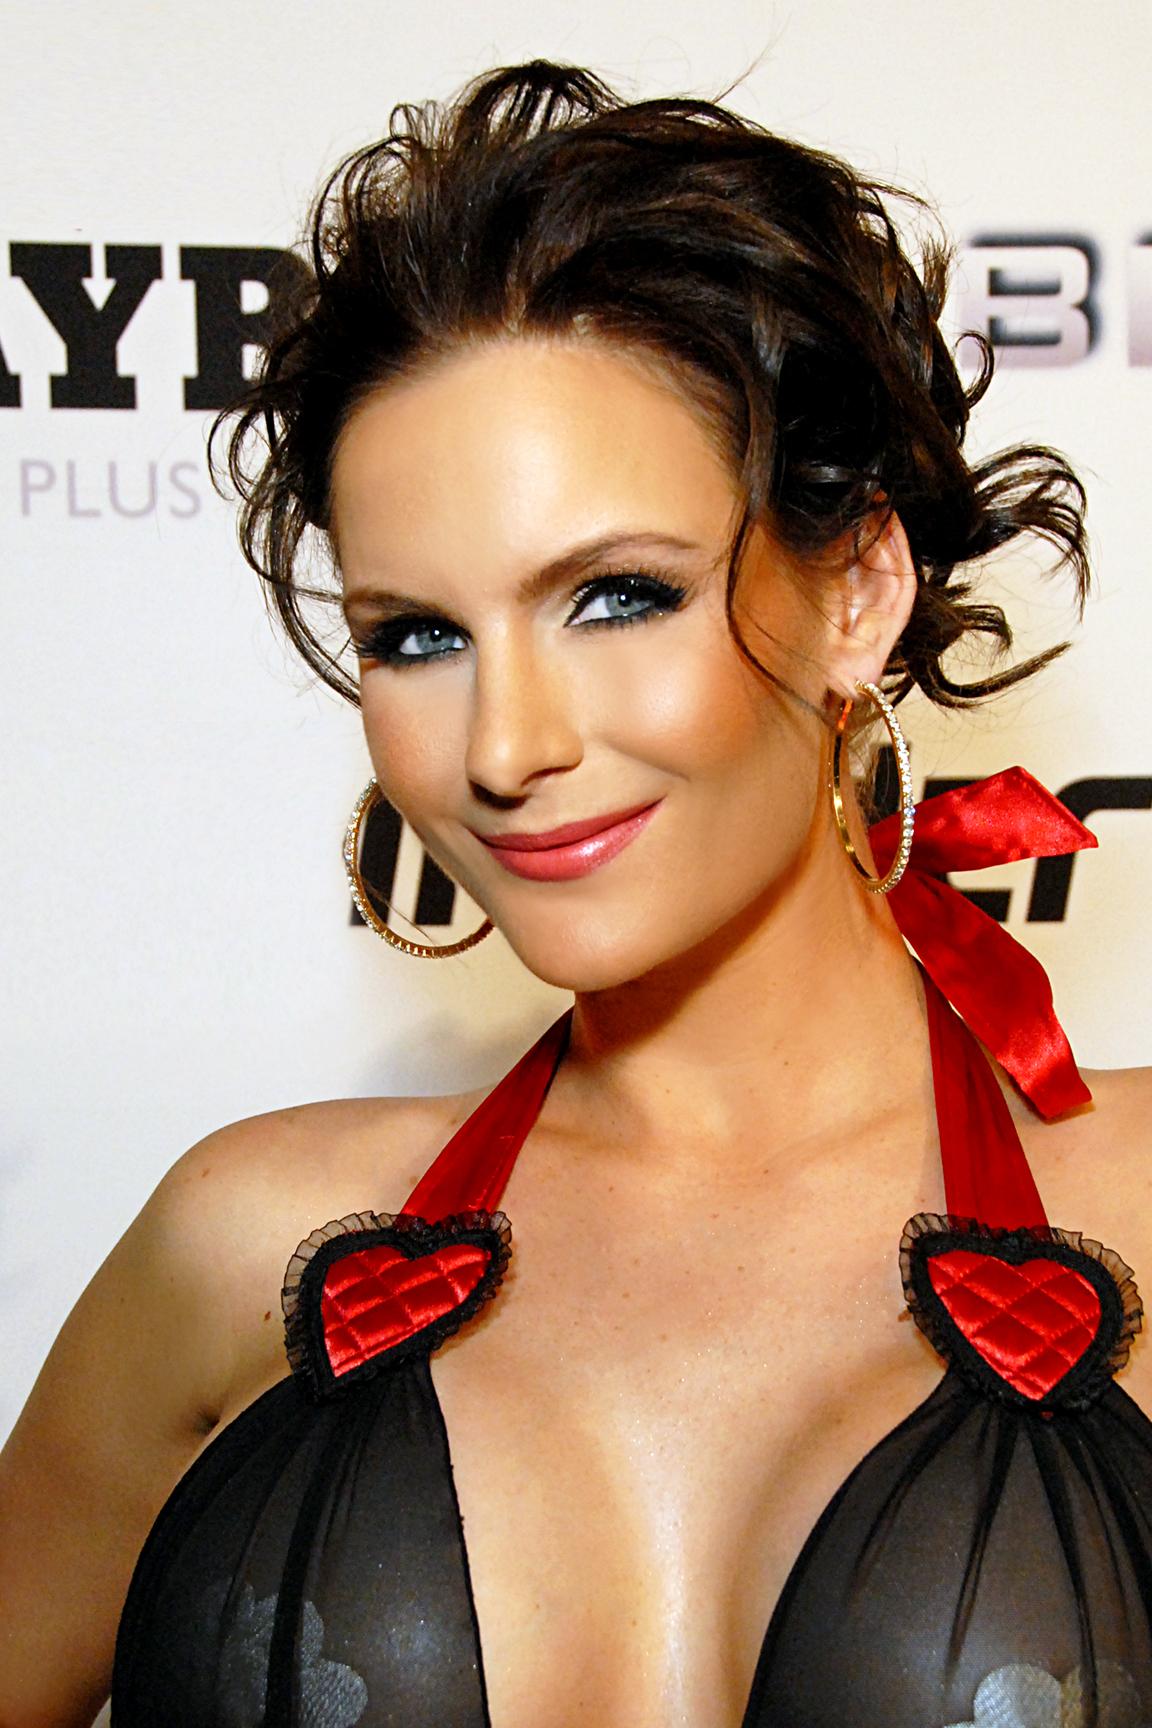 Phoenix Mary Porn Star